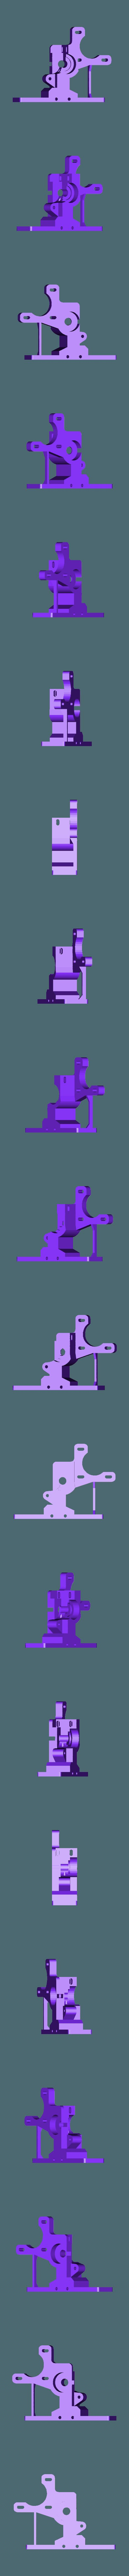 Soporte_Extrusor_Prusa_RichRap.stl Download free STL file Soporte All-Metal HotEnd - J-Head - Quick-Fit • 3D printing design, fabrica3d